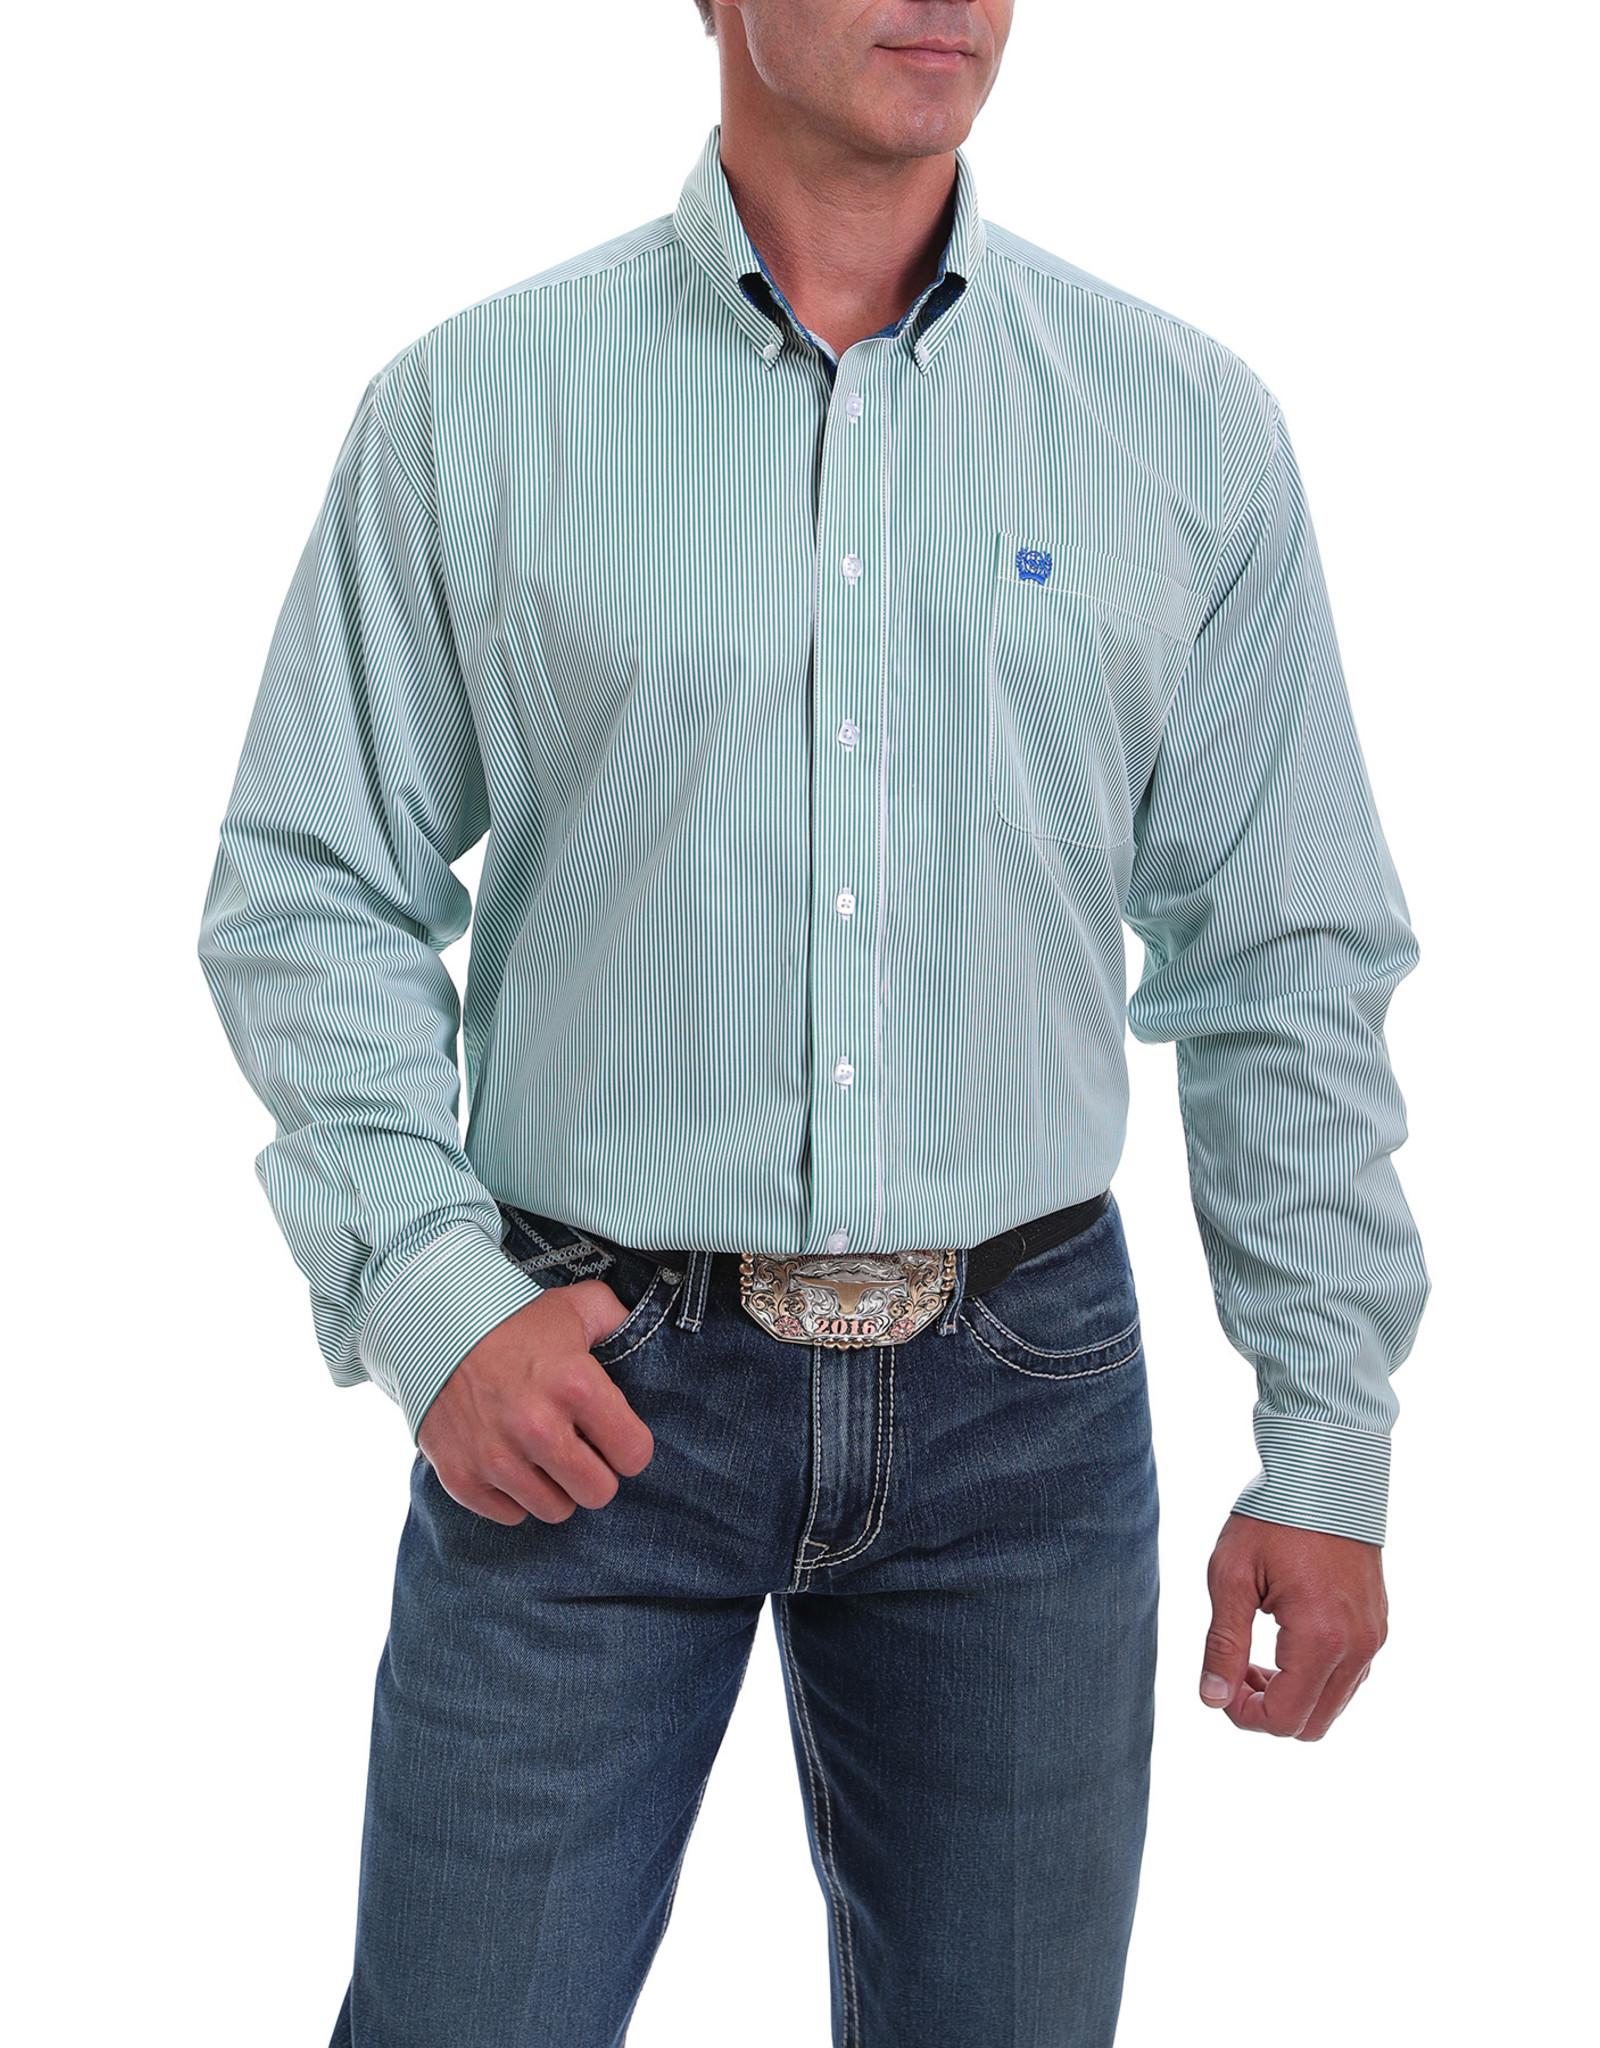 Cinch Cinch Classic Fit Stripe Tencel Shirt